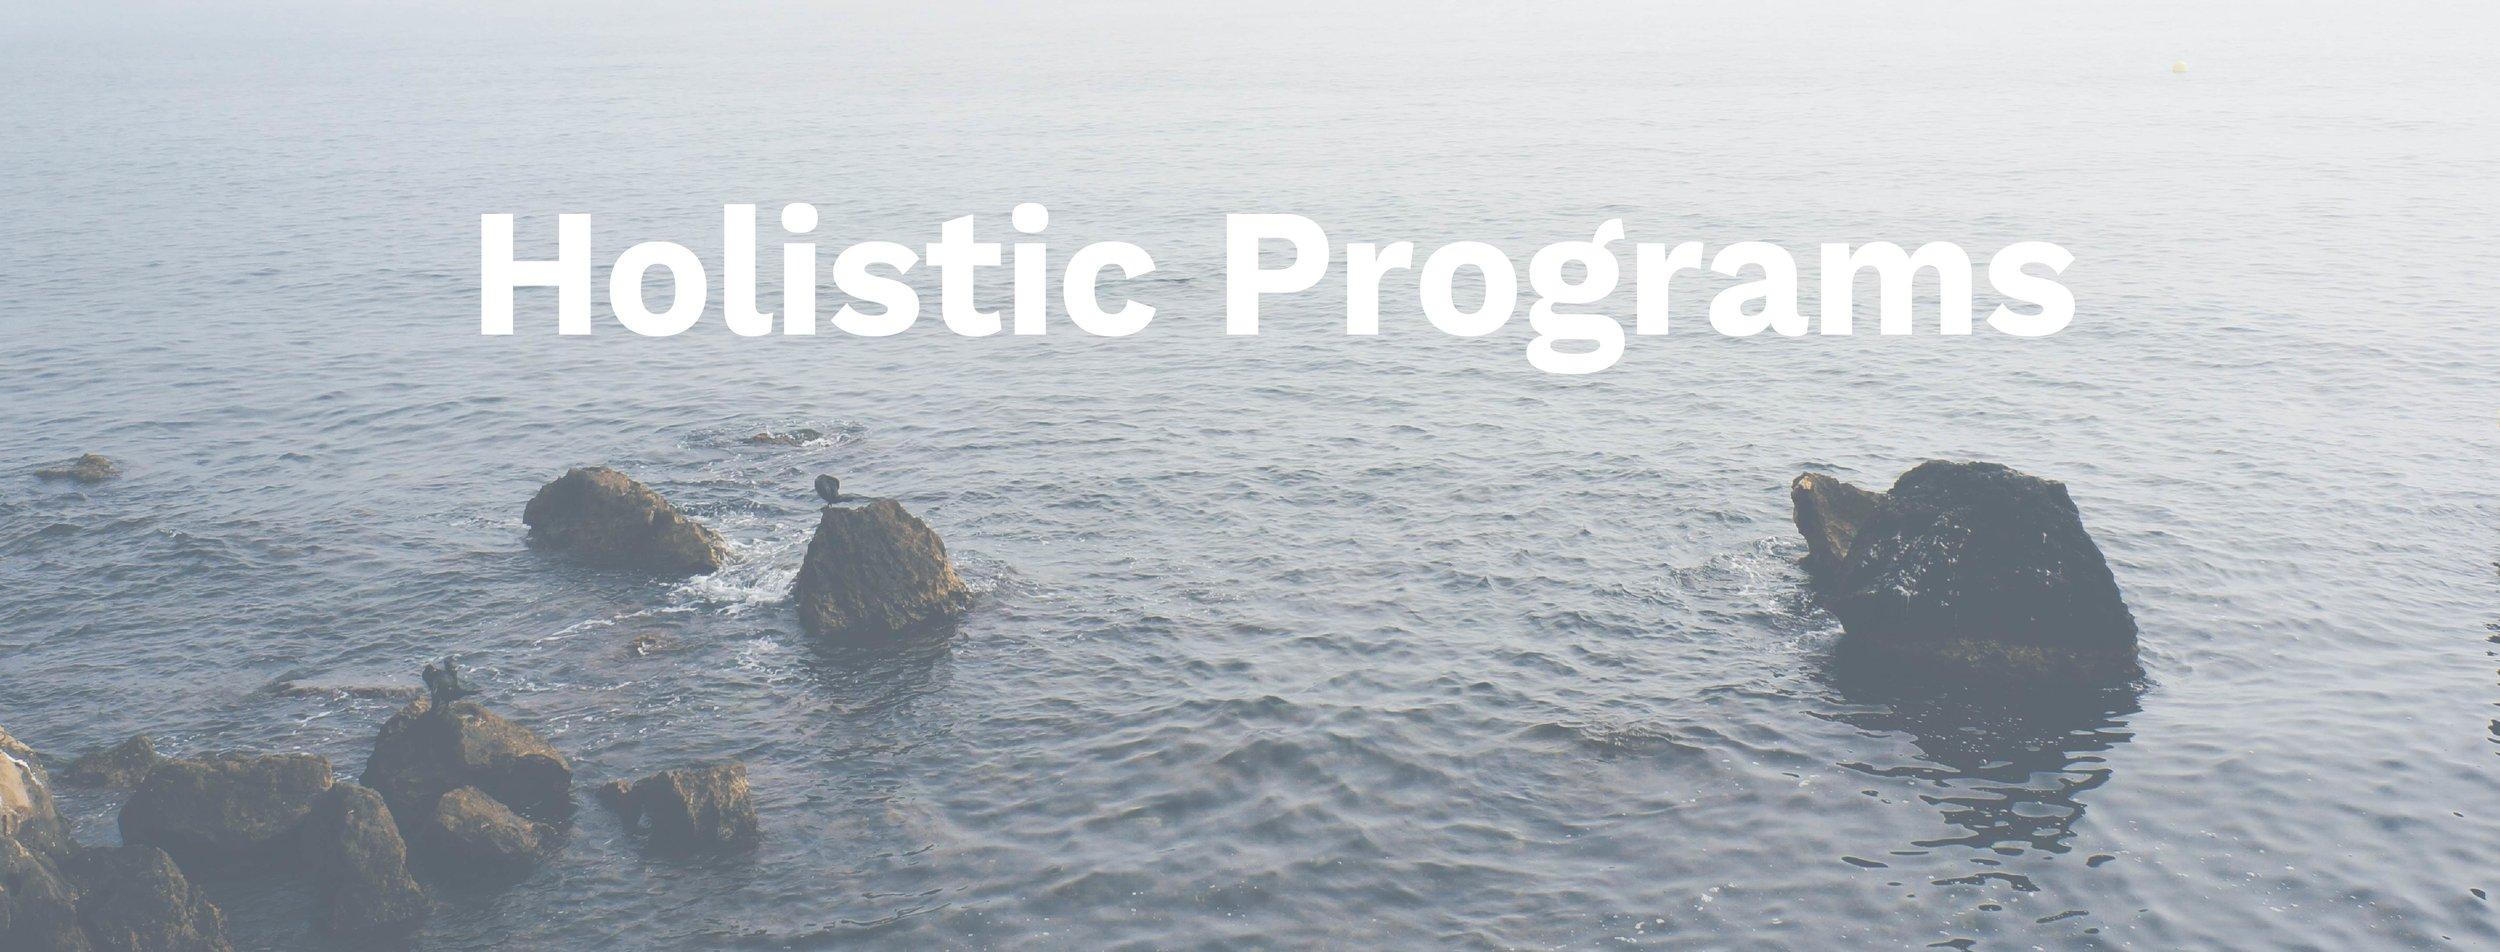 Holistic Programs Header-09.jpg